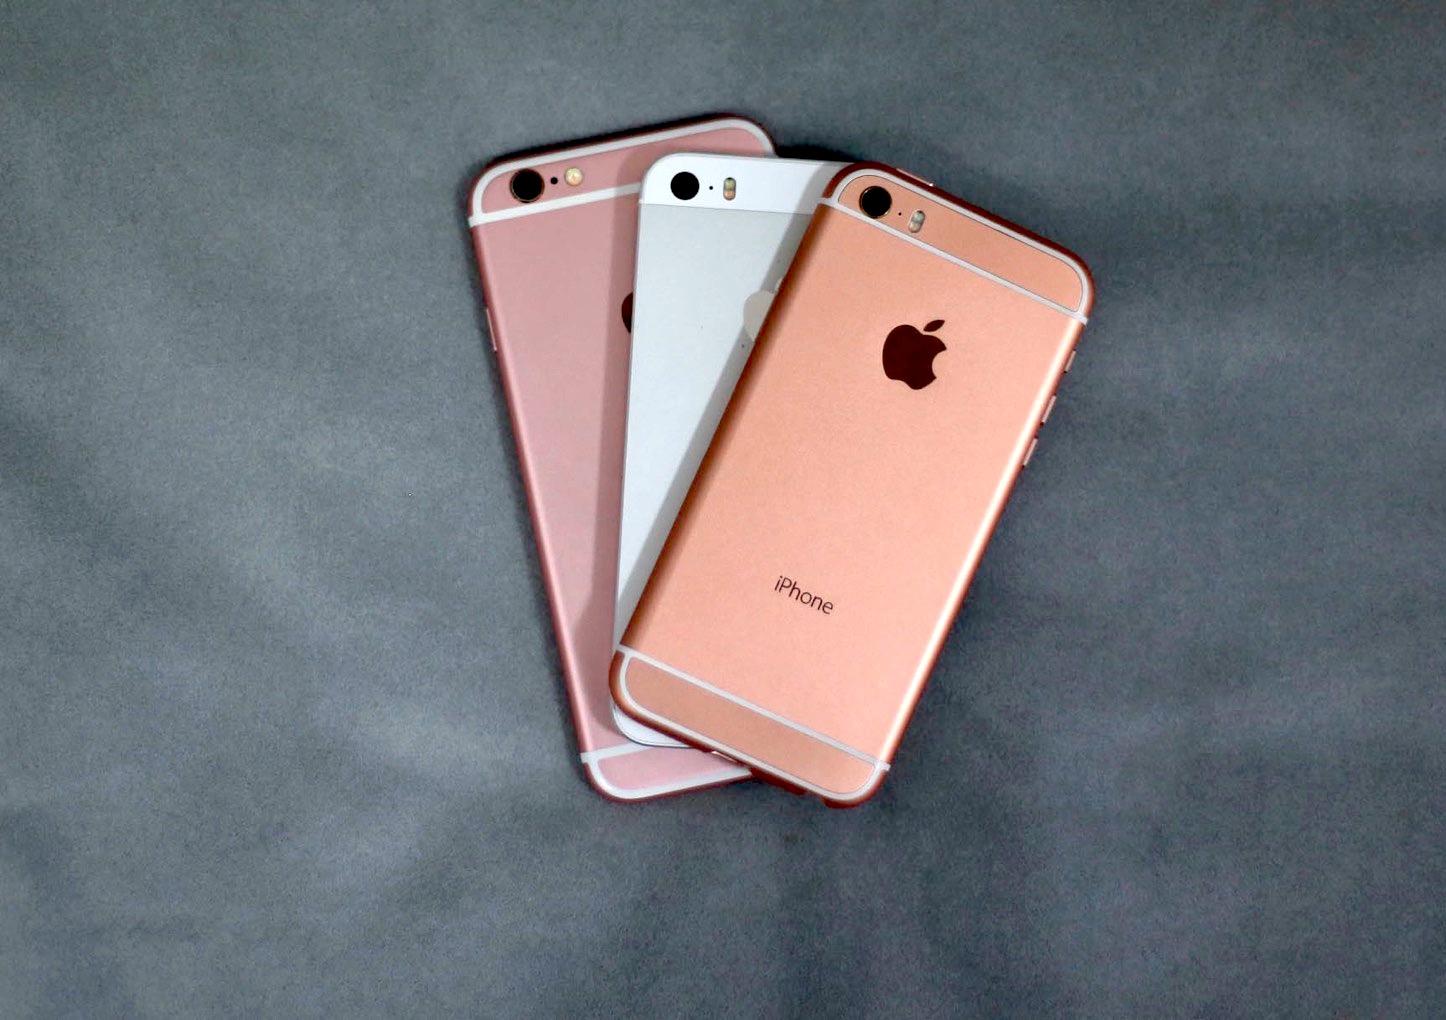 iPhone-SE-Fake-Samples-from-China-01.jpg